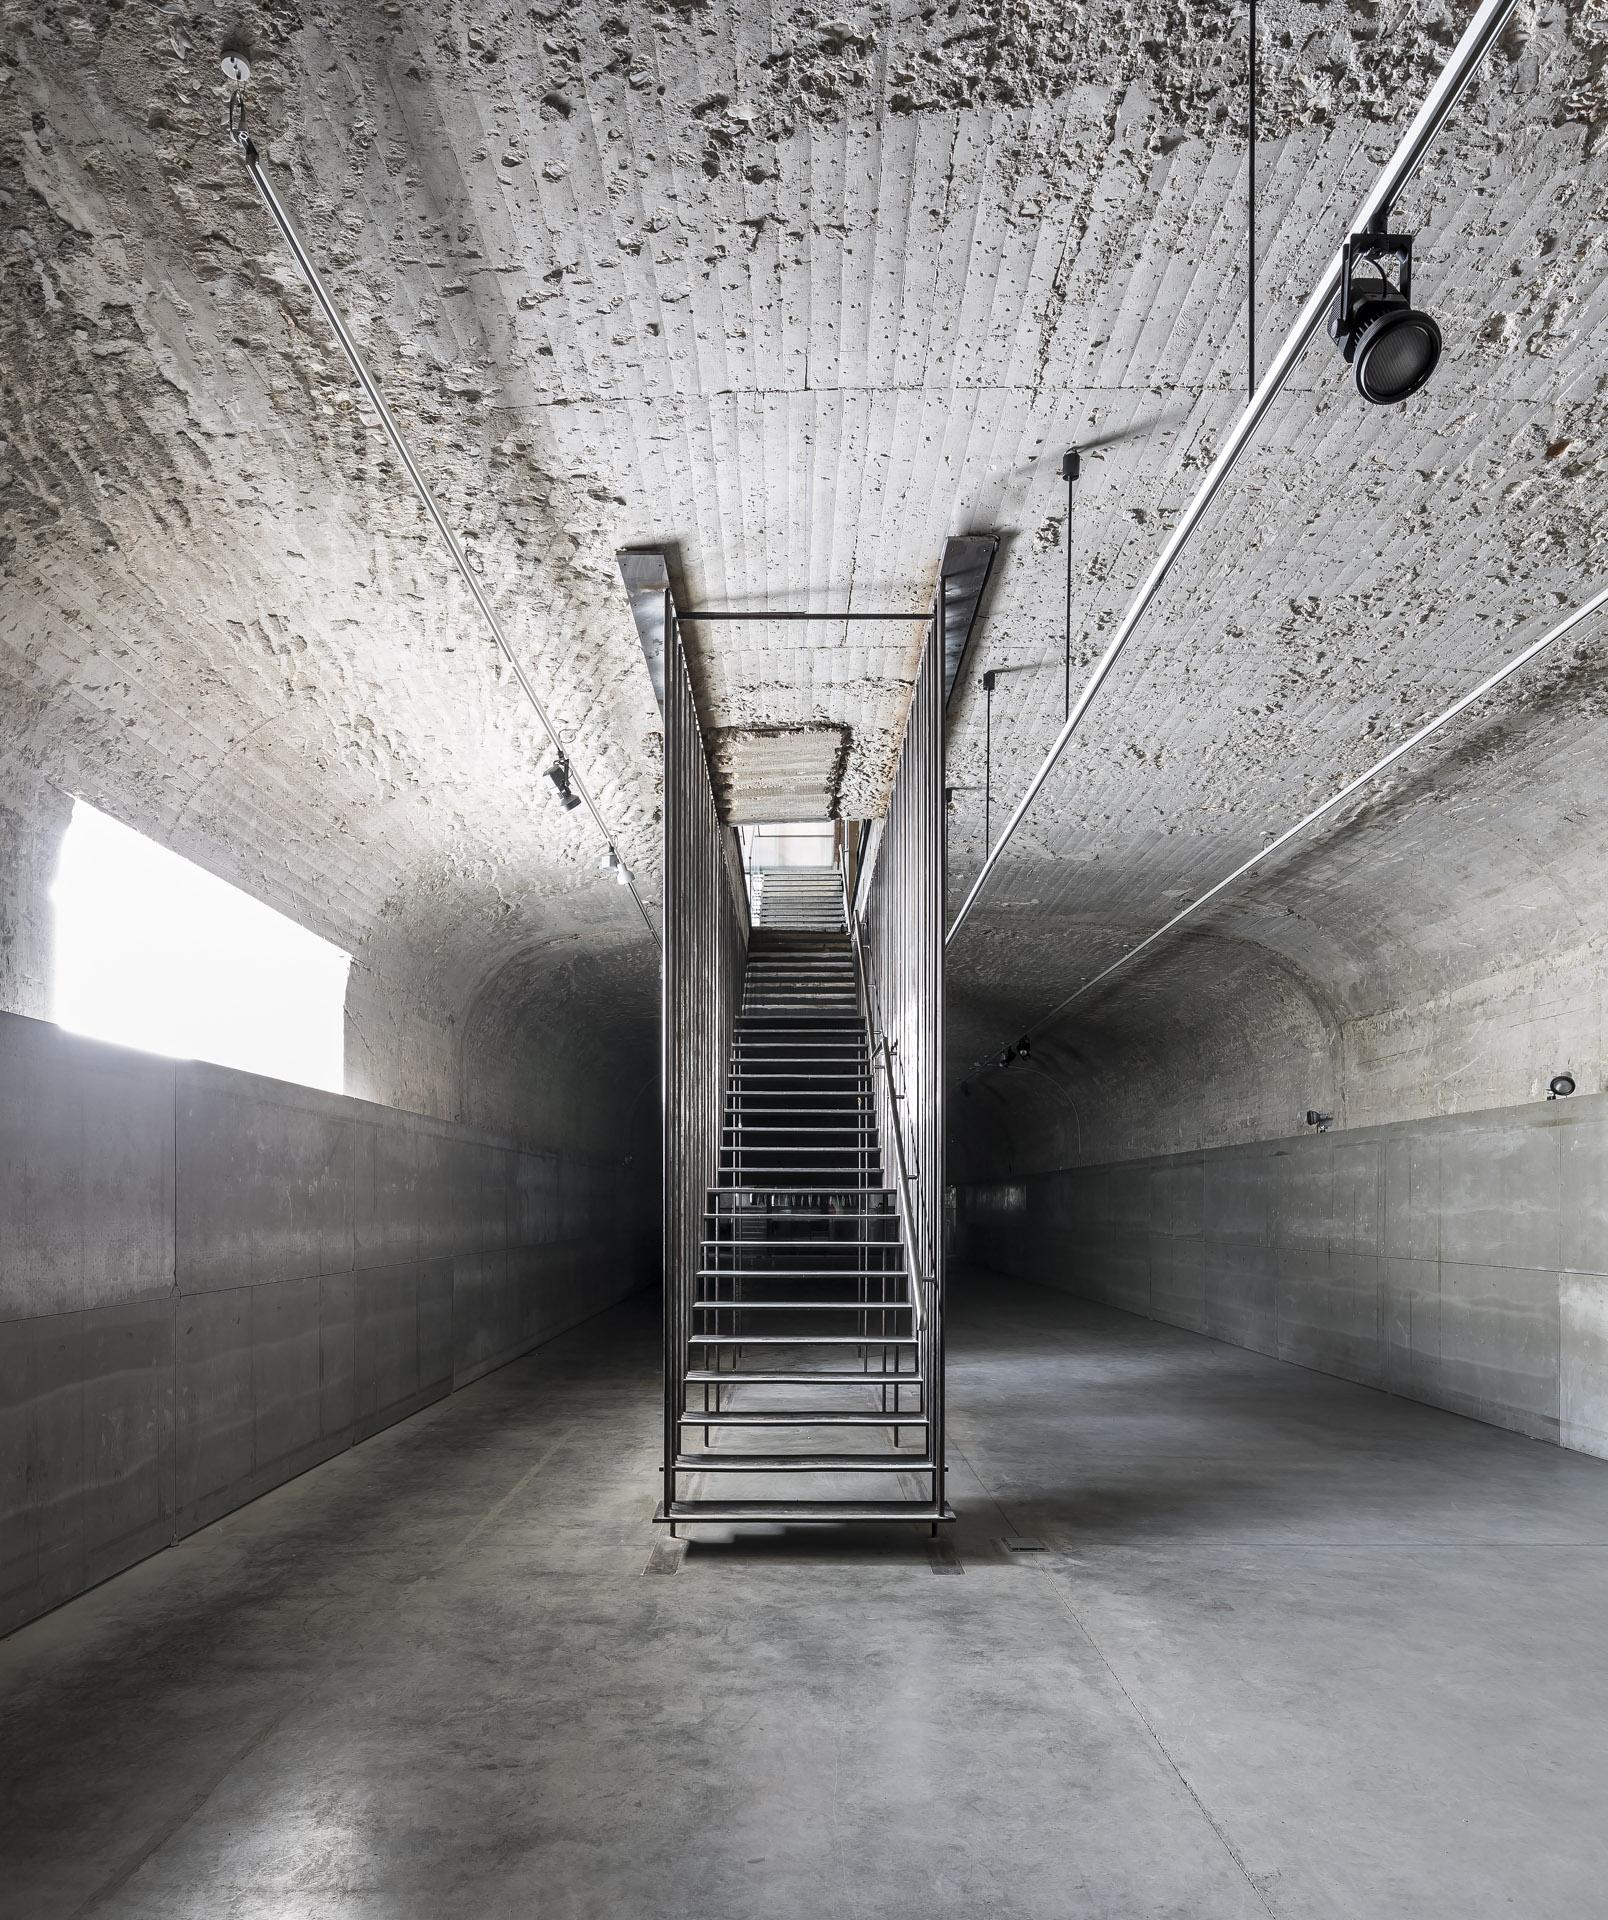 fotografia-arquitectura-madrid-nuevos-ministerios-elorza-german-cabo-12